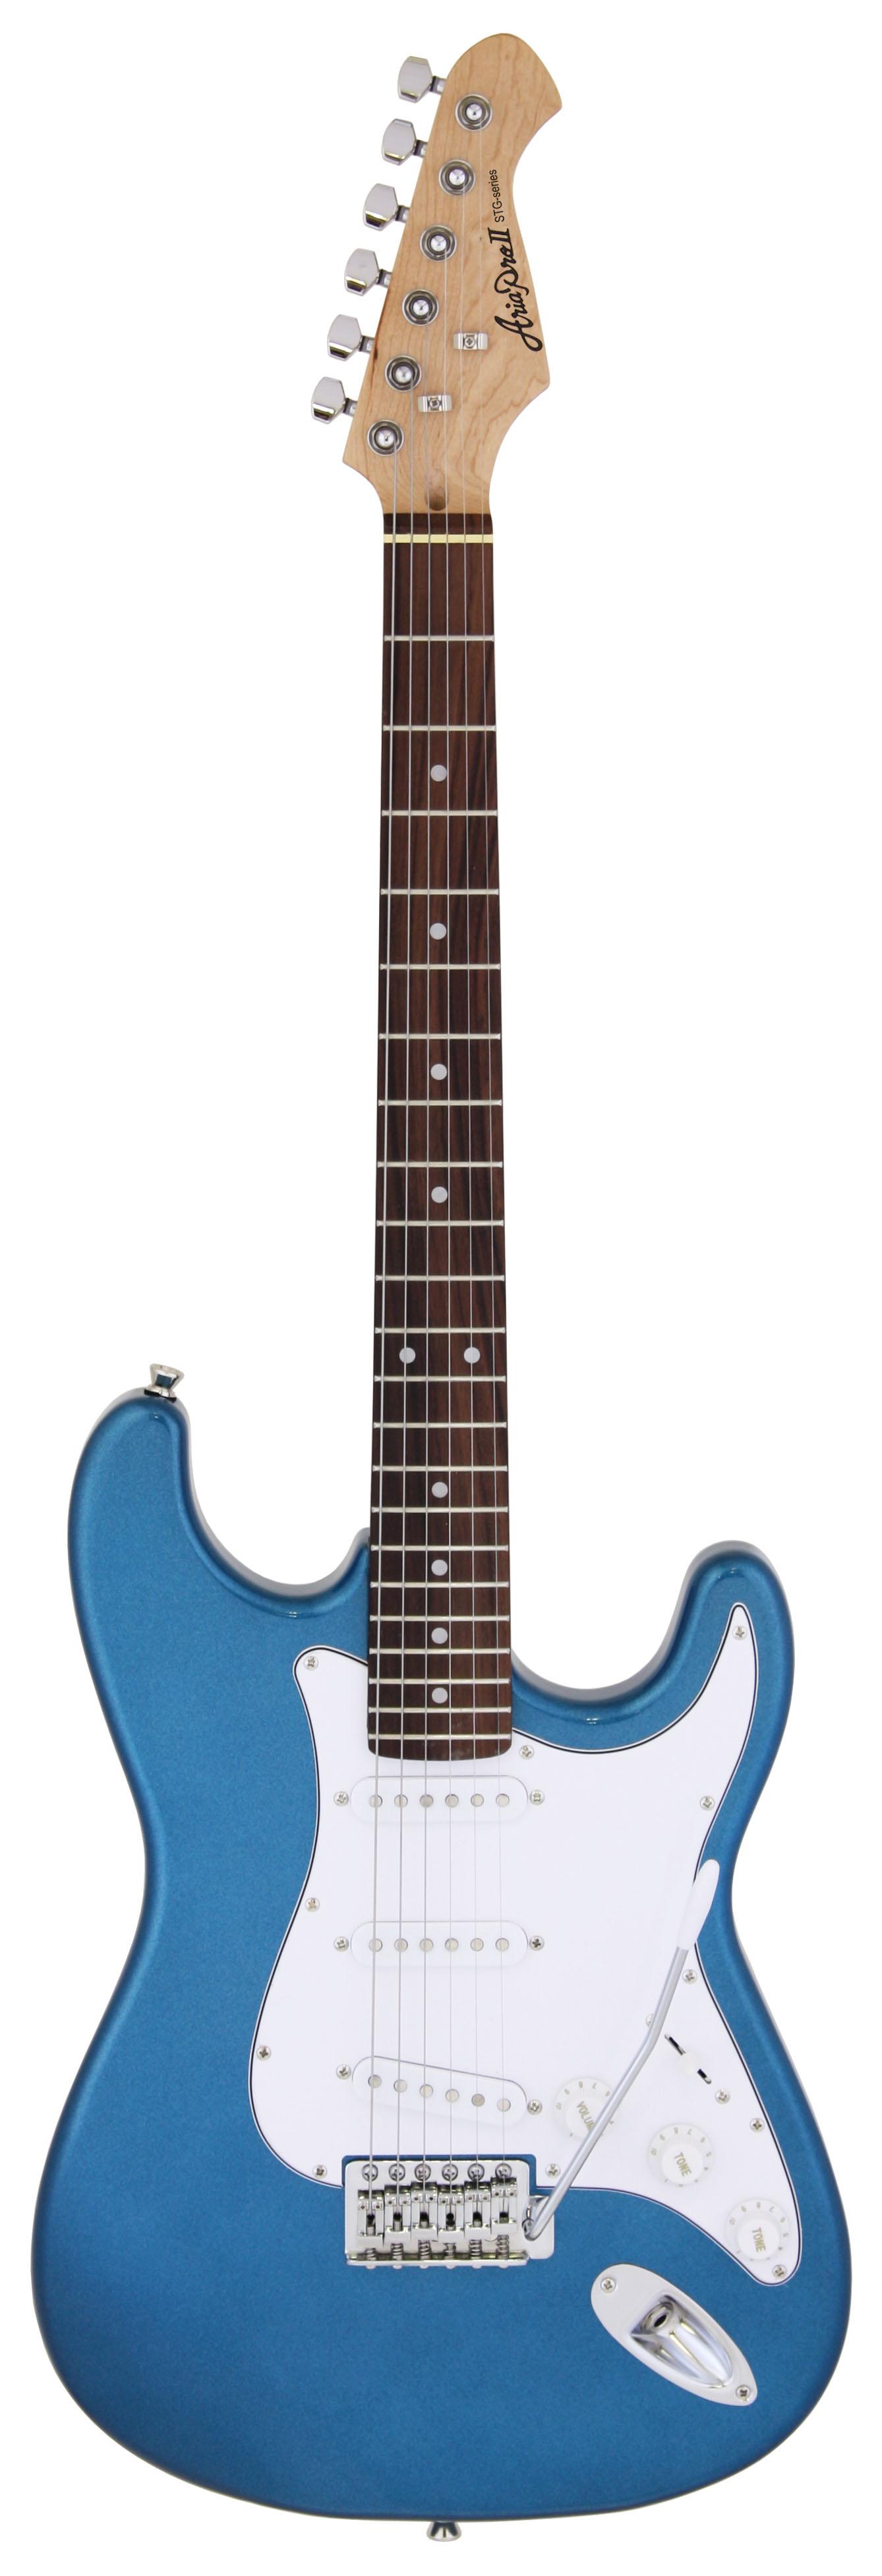 Aria Pro II STG-003 Double Cutaway Electric Guitar